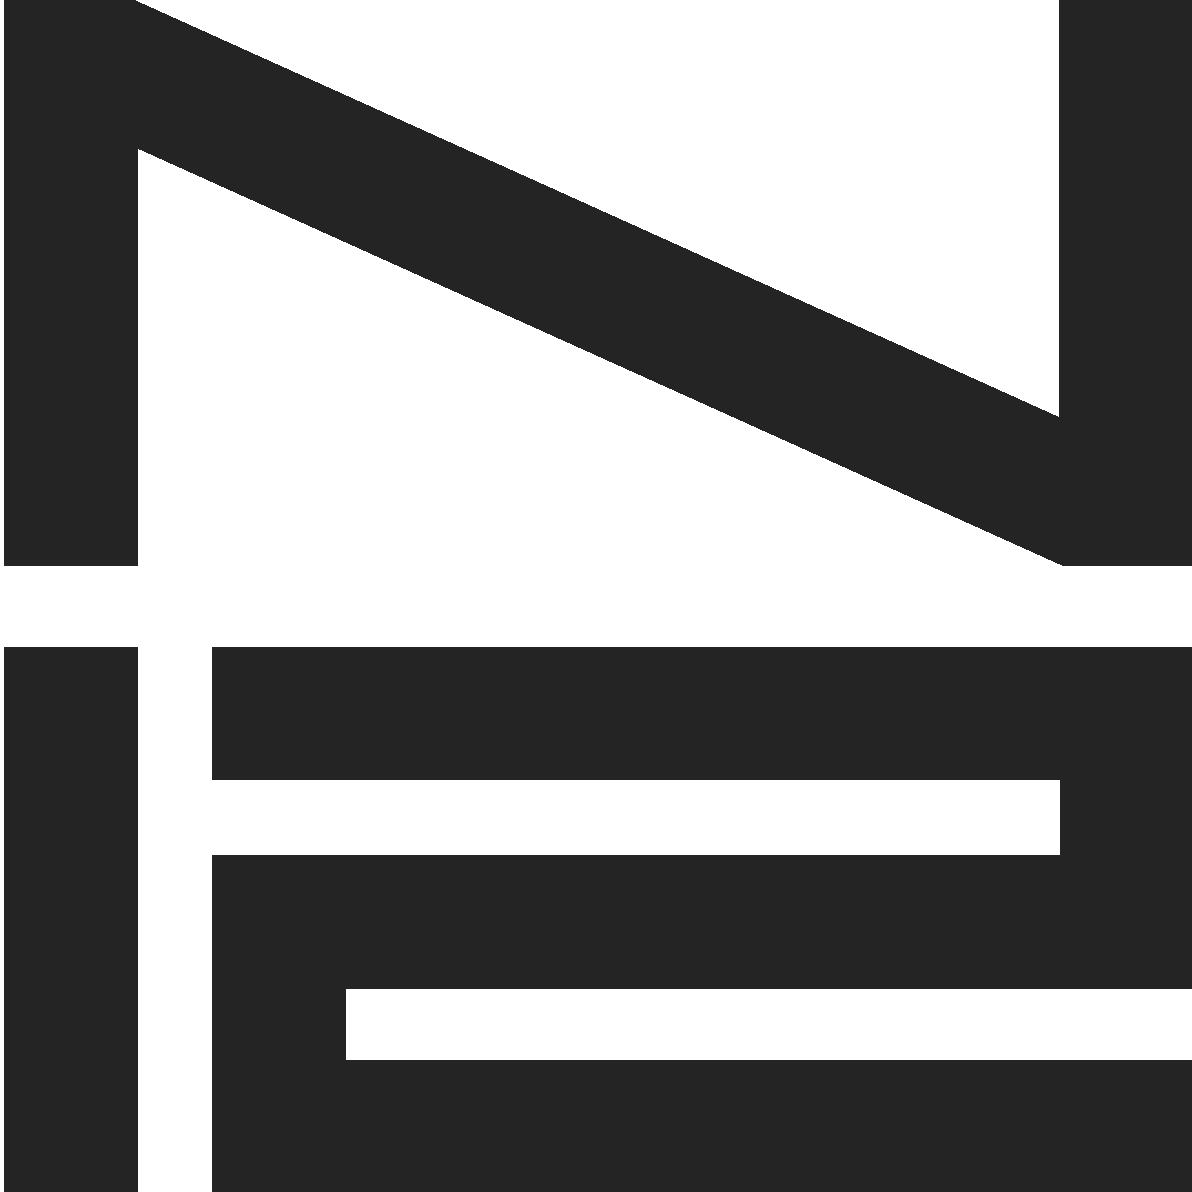 Empresas Desafio10x: N12